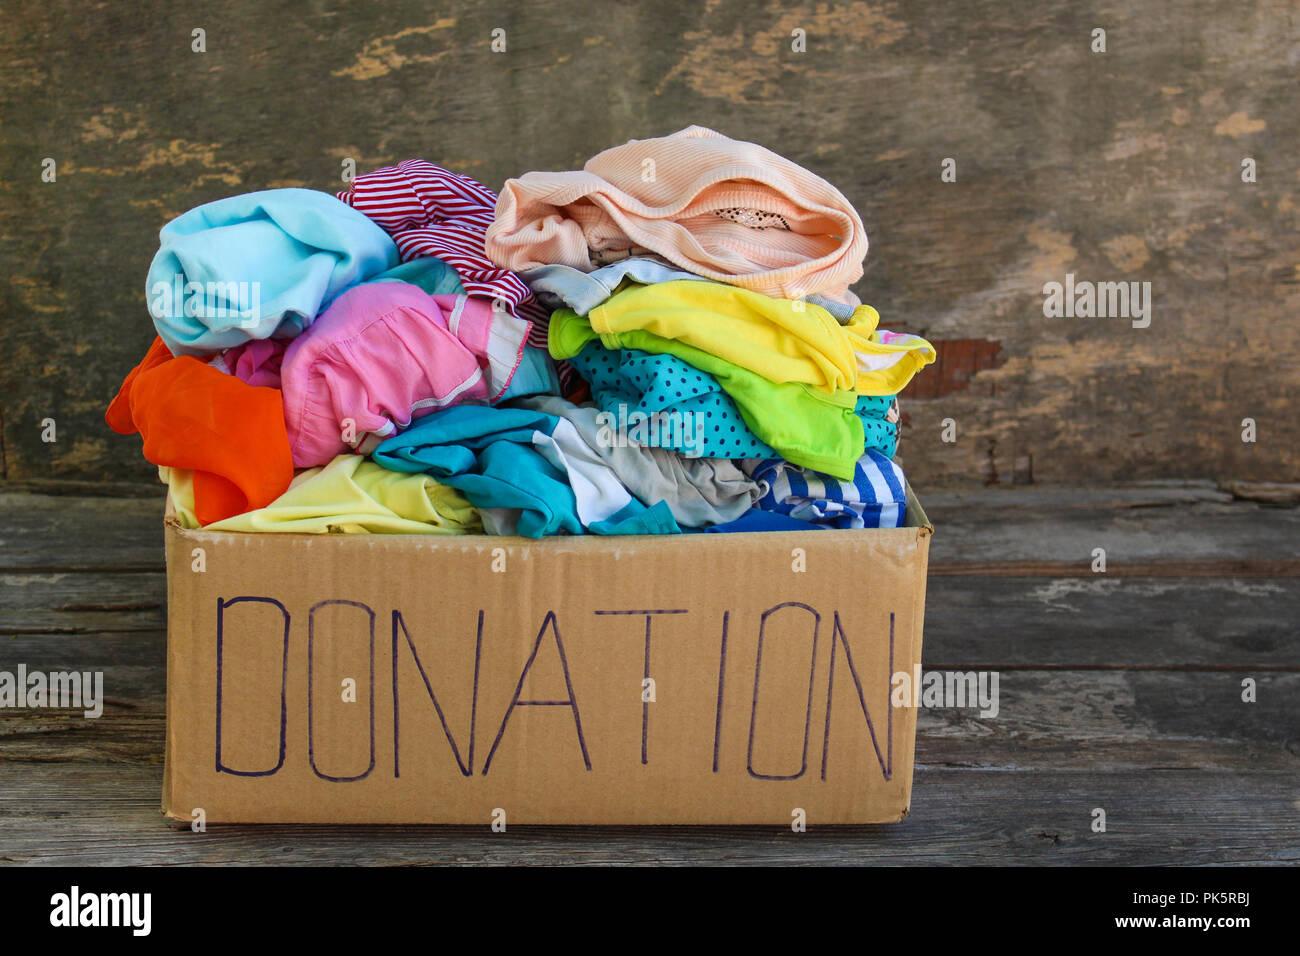 Donation Box Stock Photos & Donation Box Stock Images - Alamy